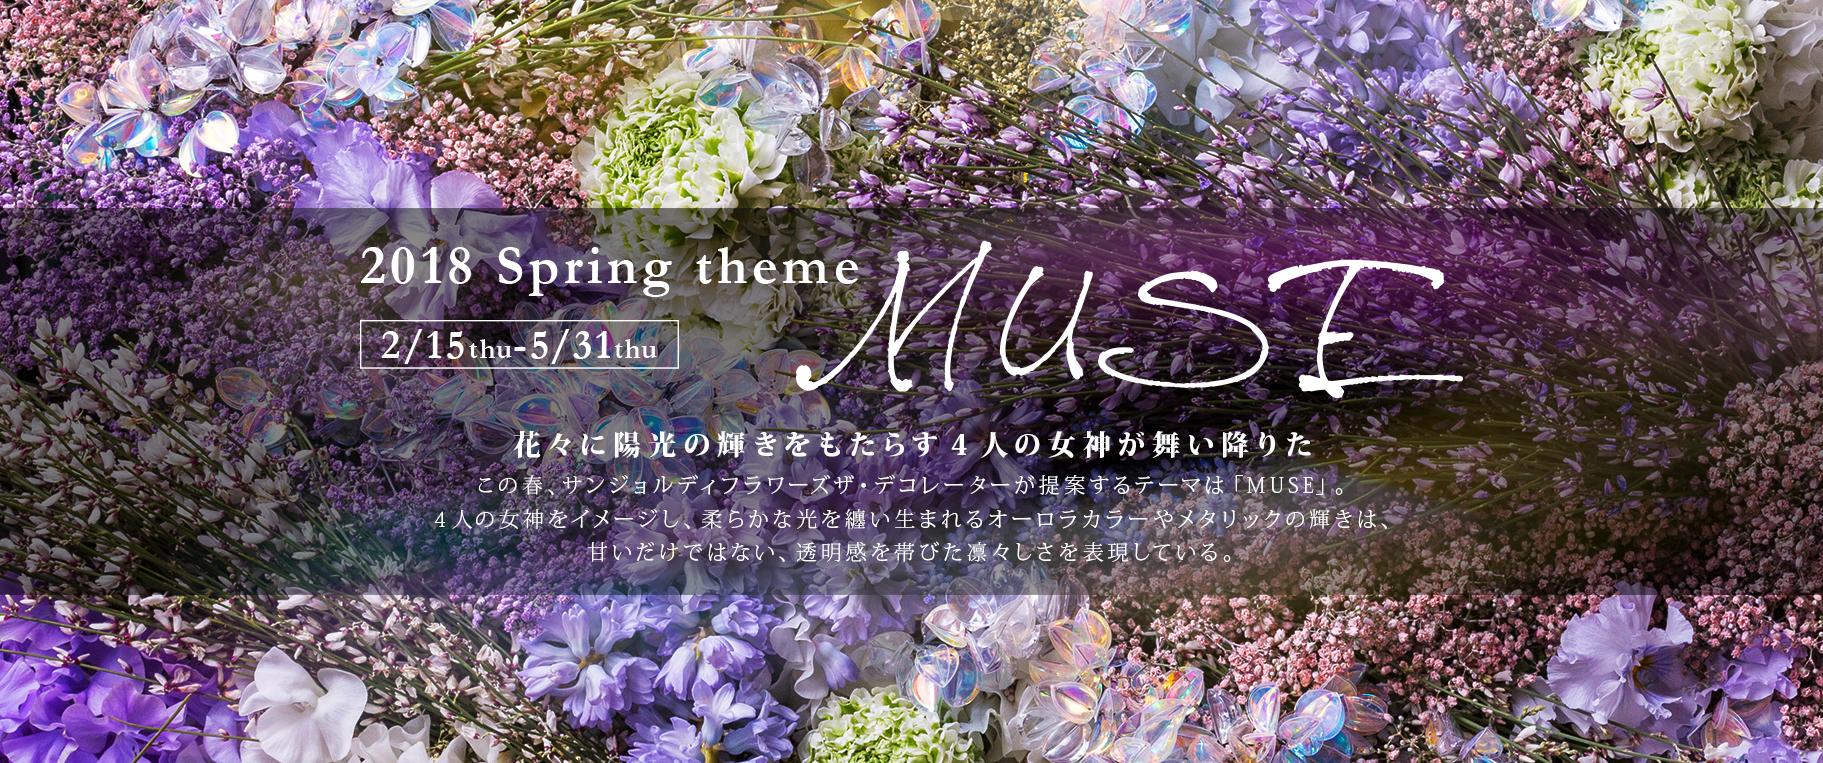 Sprinf theme 2018 「MUSE」